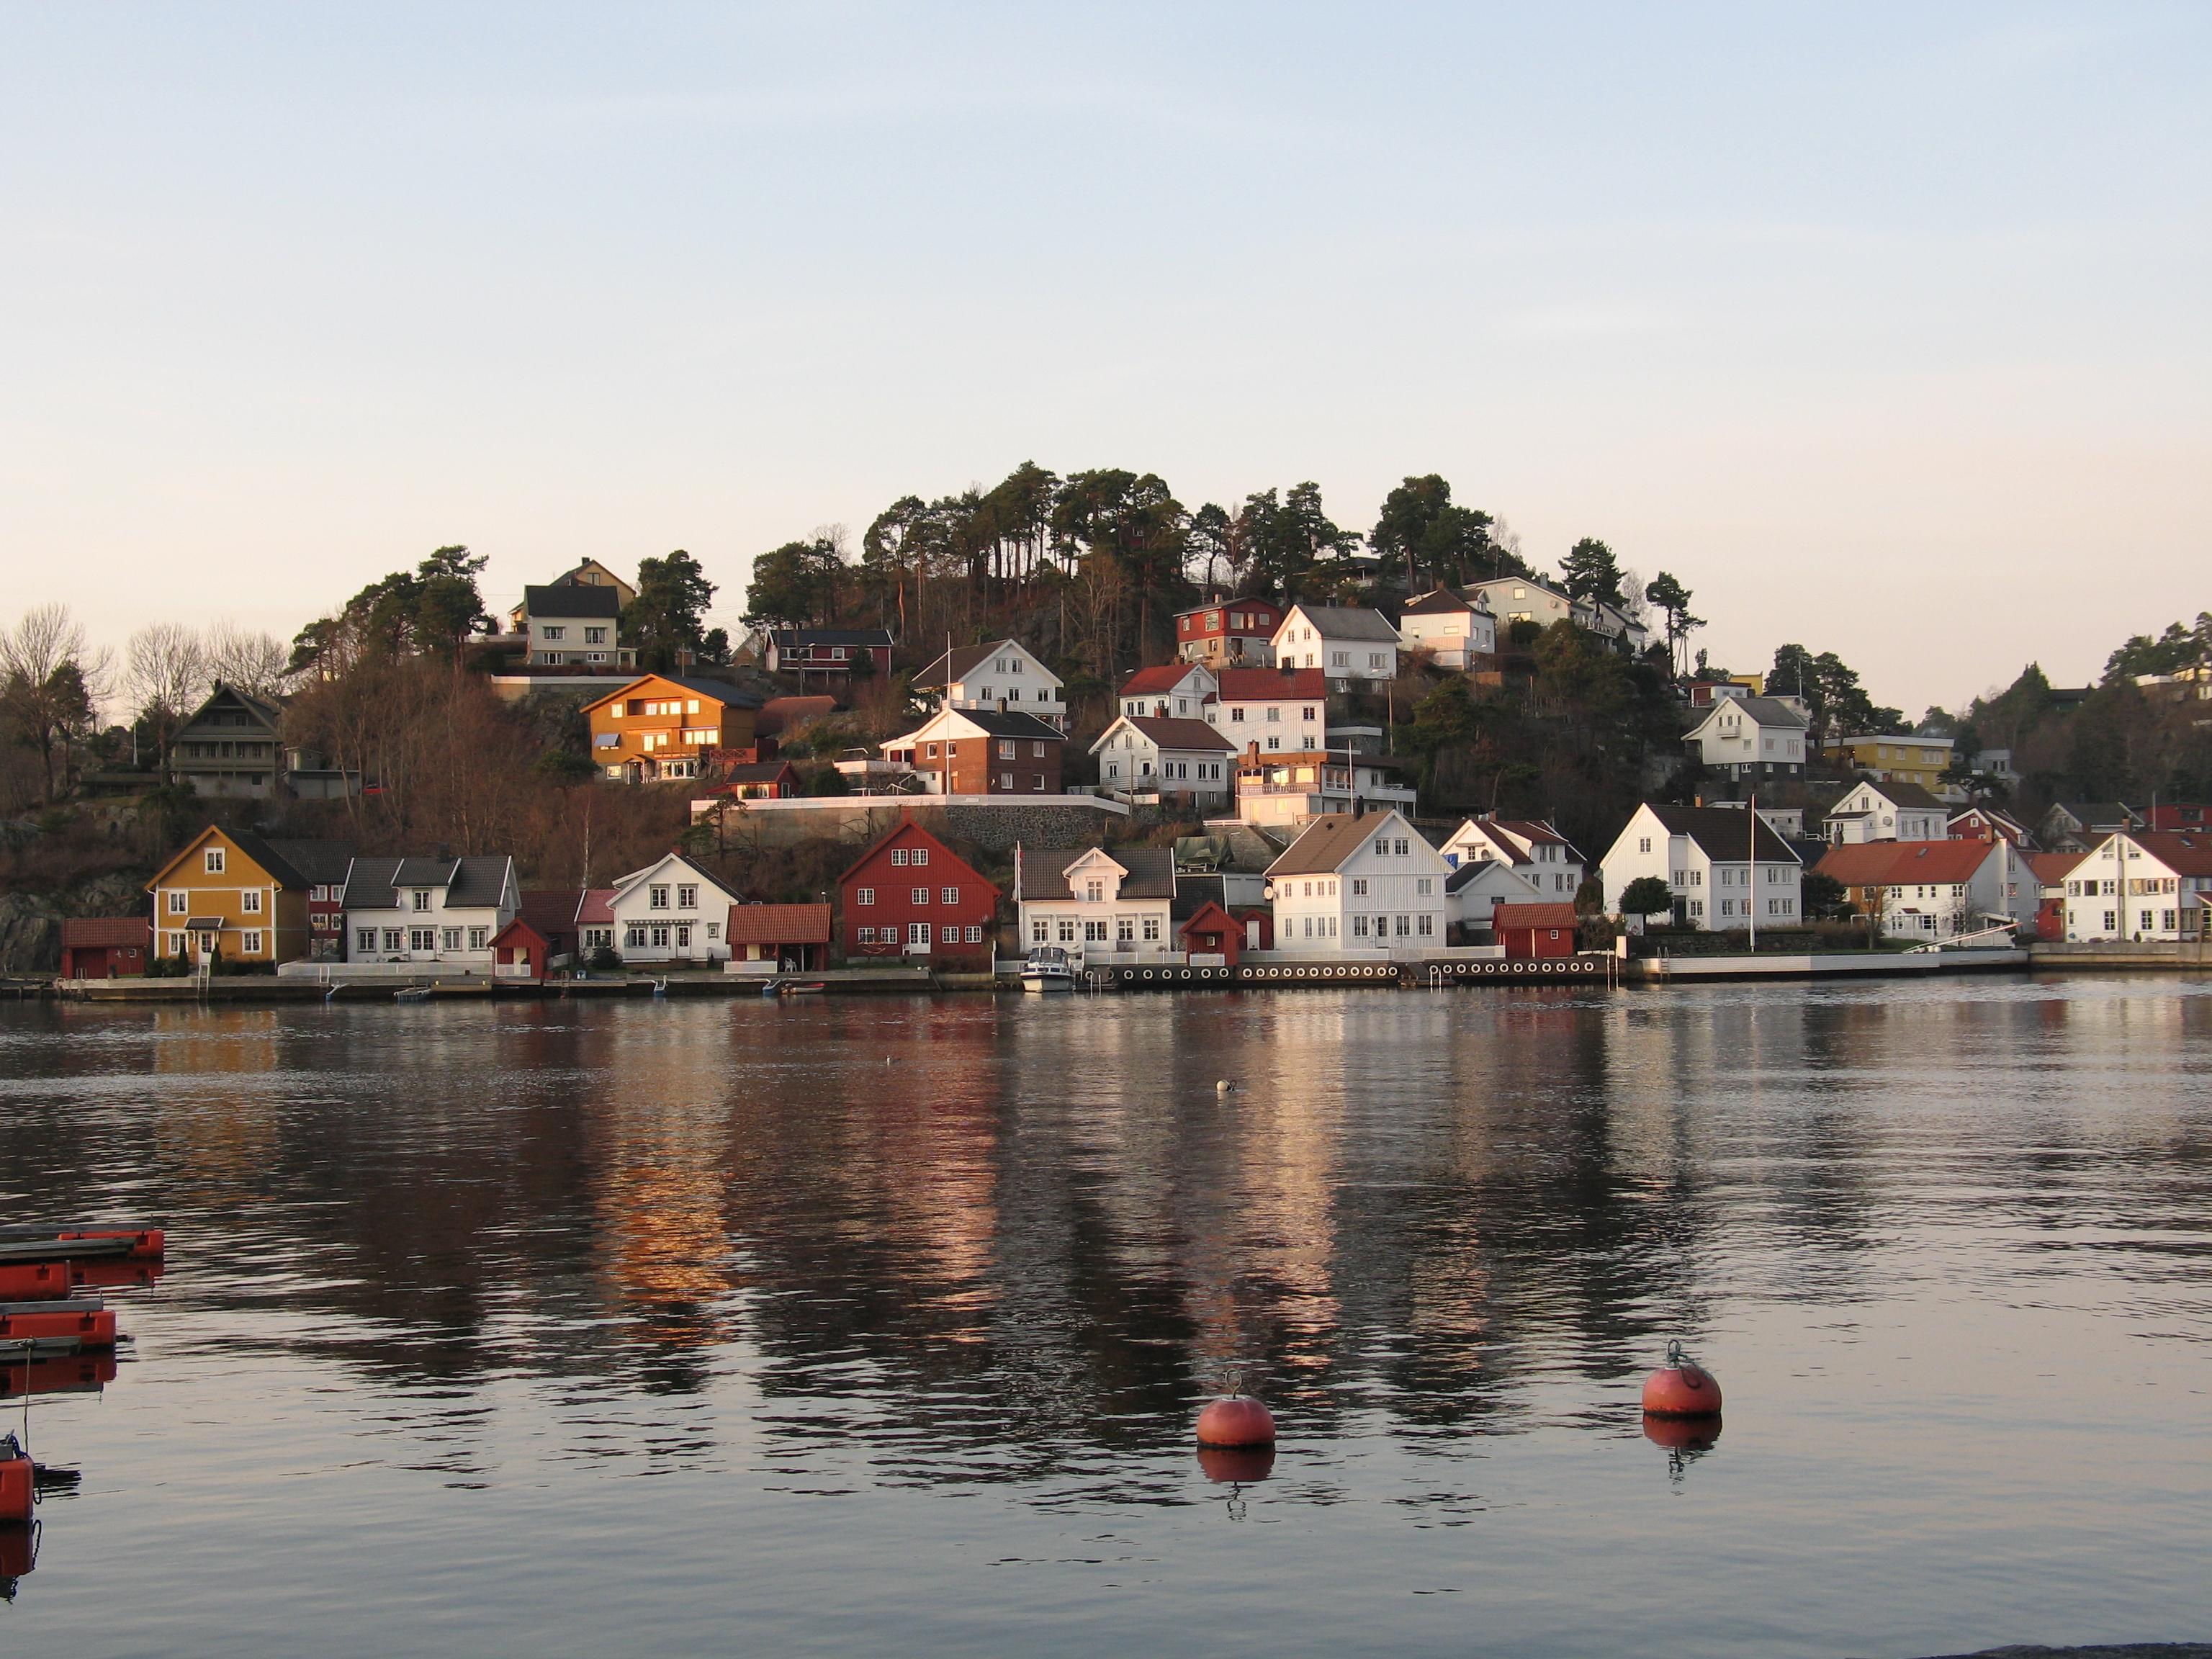 File:Arendal Hansnes.JPG - Wikimedia Commons